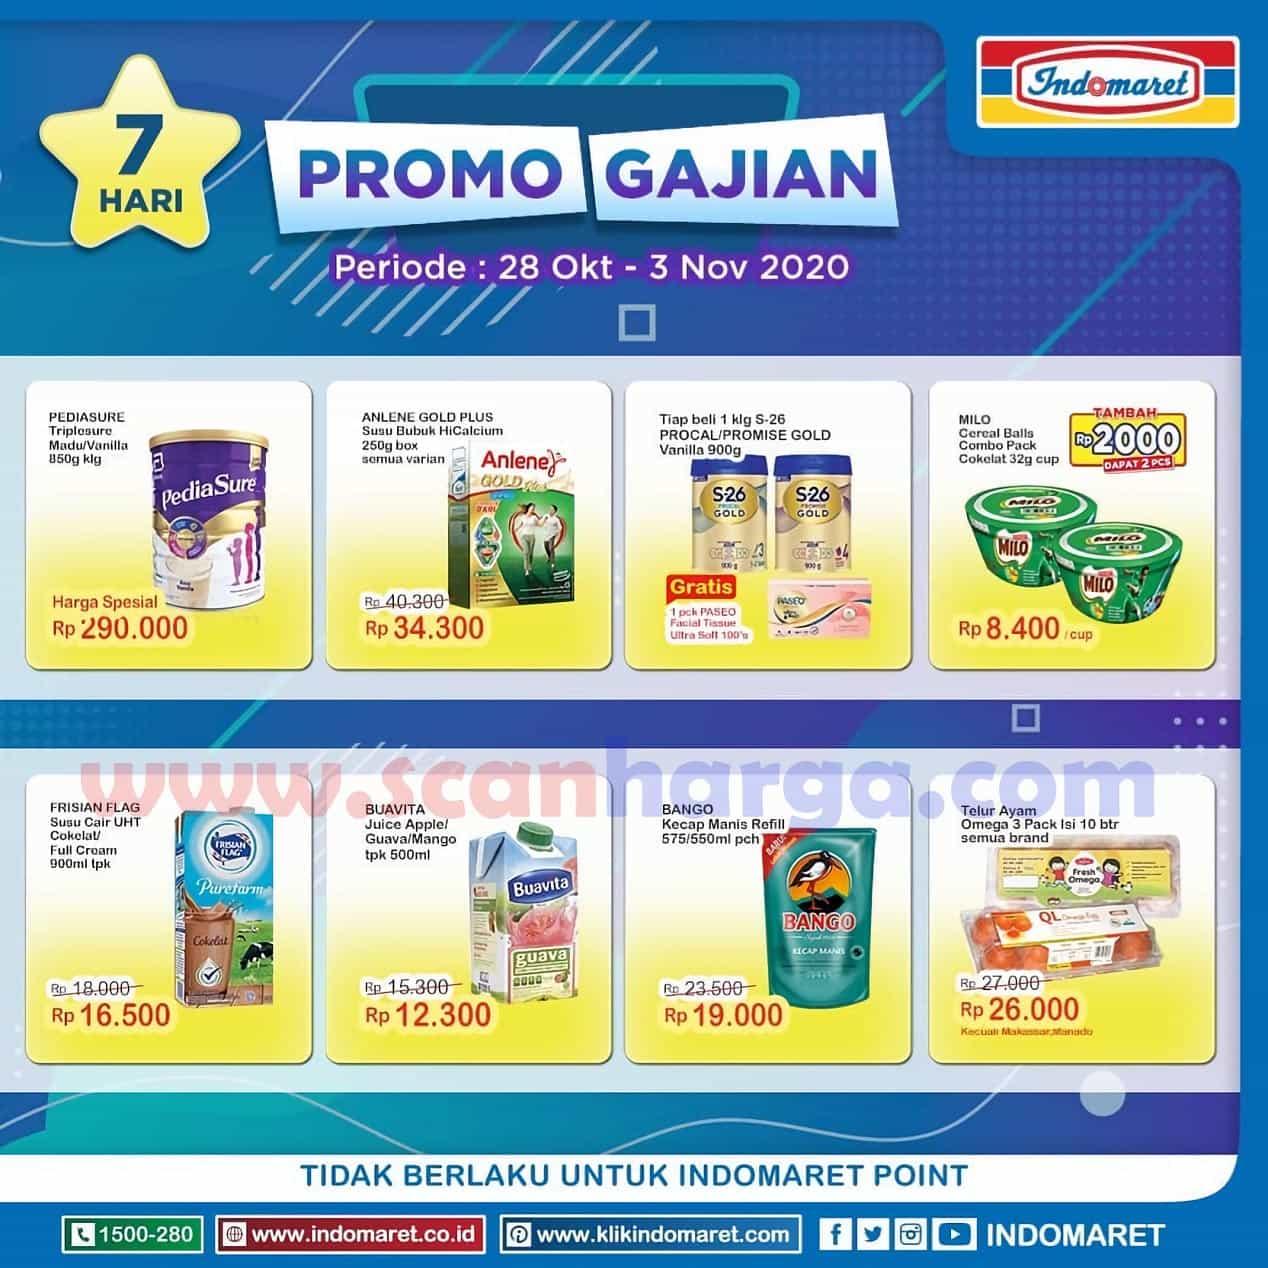 JSM INDOMARET GAJIAN Promo Tebus Murah Periode 28 Oktober - 1 November 2020 2